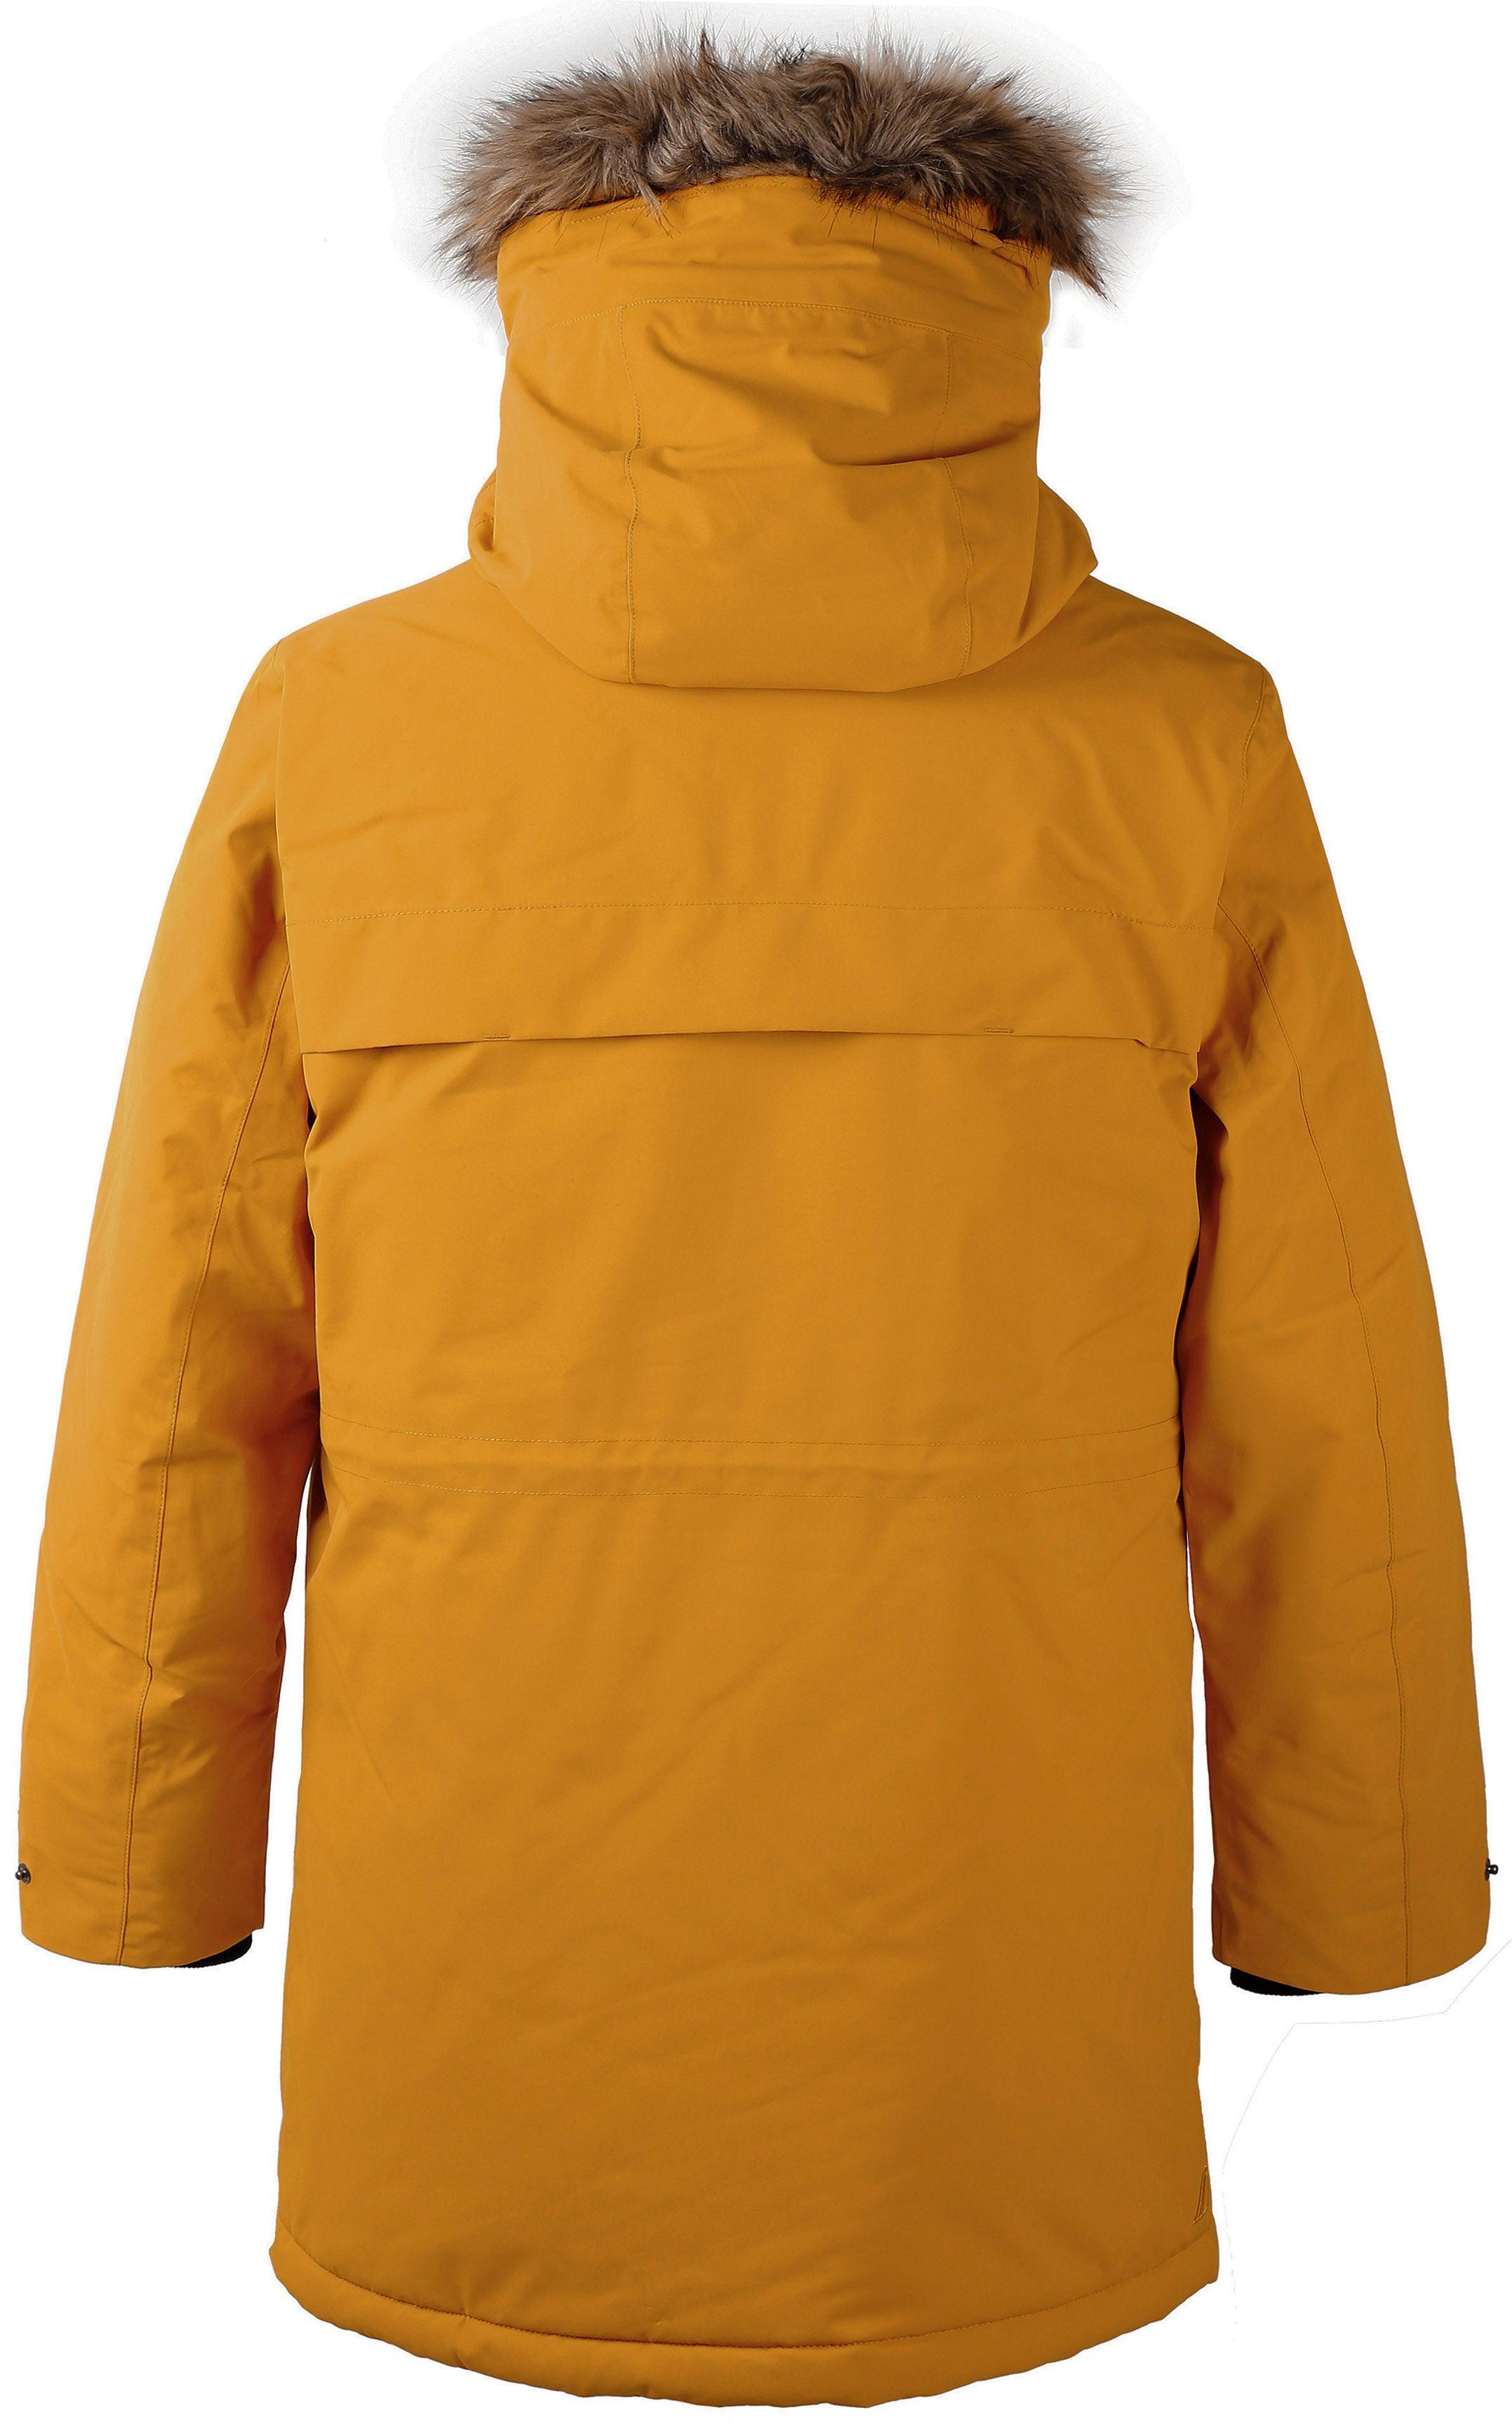 WINTER SALE Didriksons Reidar USX Parka 2 Jacket Yellow Ochre